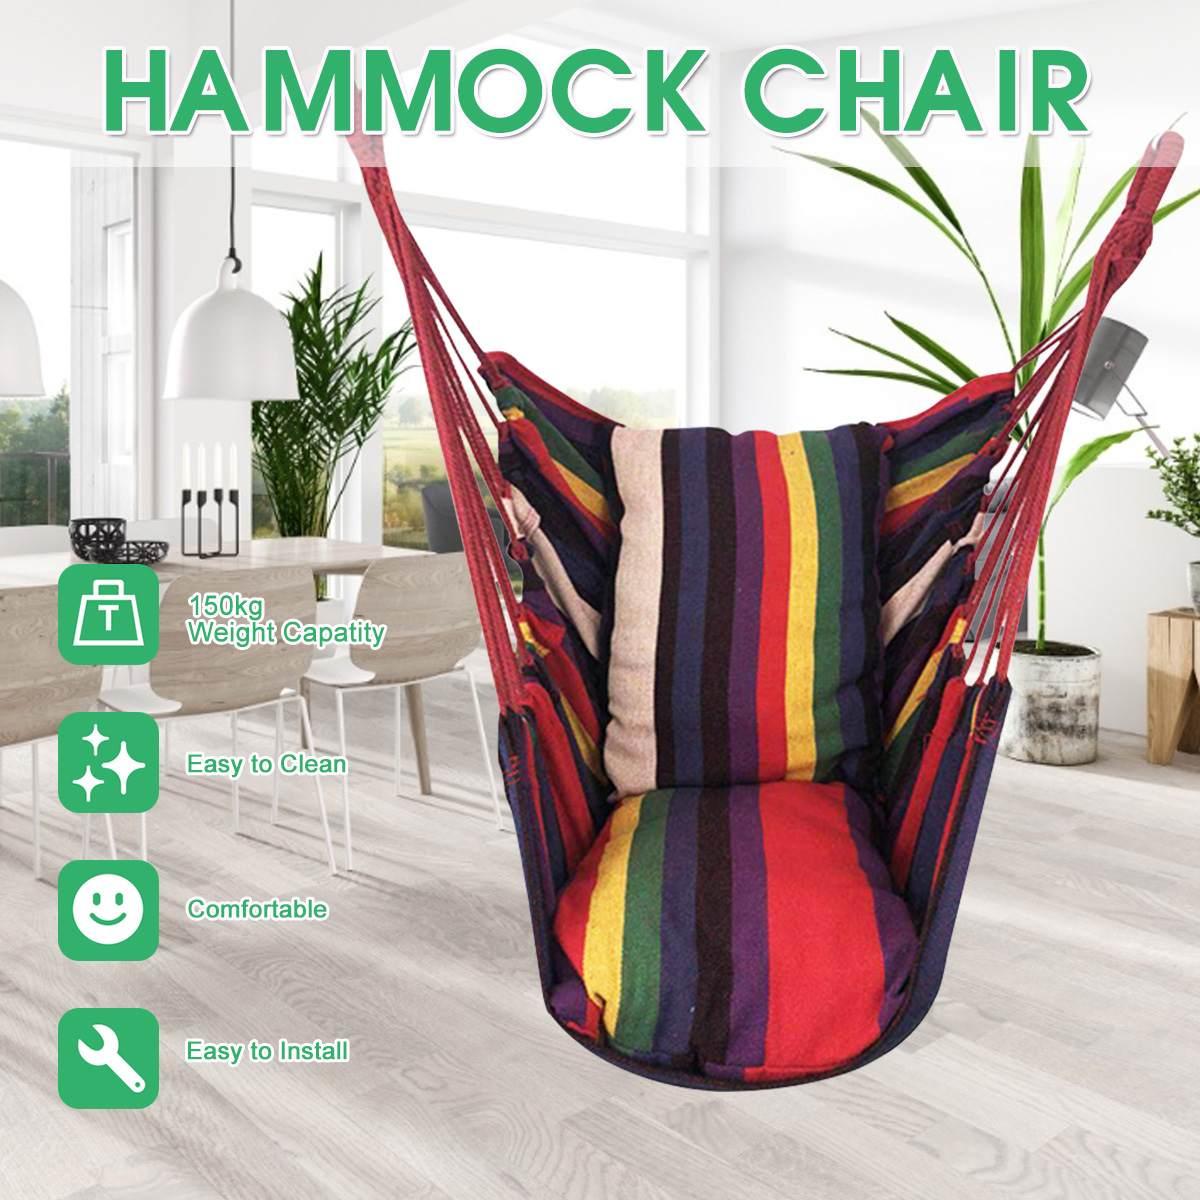 Portable Swing Seat Hammock Chair Swing Chair Patio Swing Outdoor Garden Hanging Chair Travel Camping Hammock Silla Colgante(China)